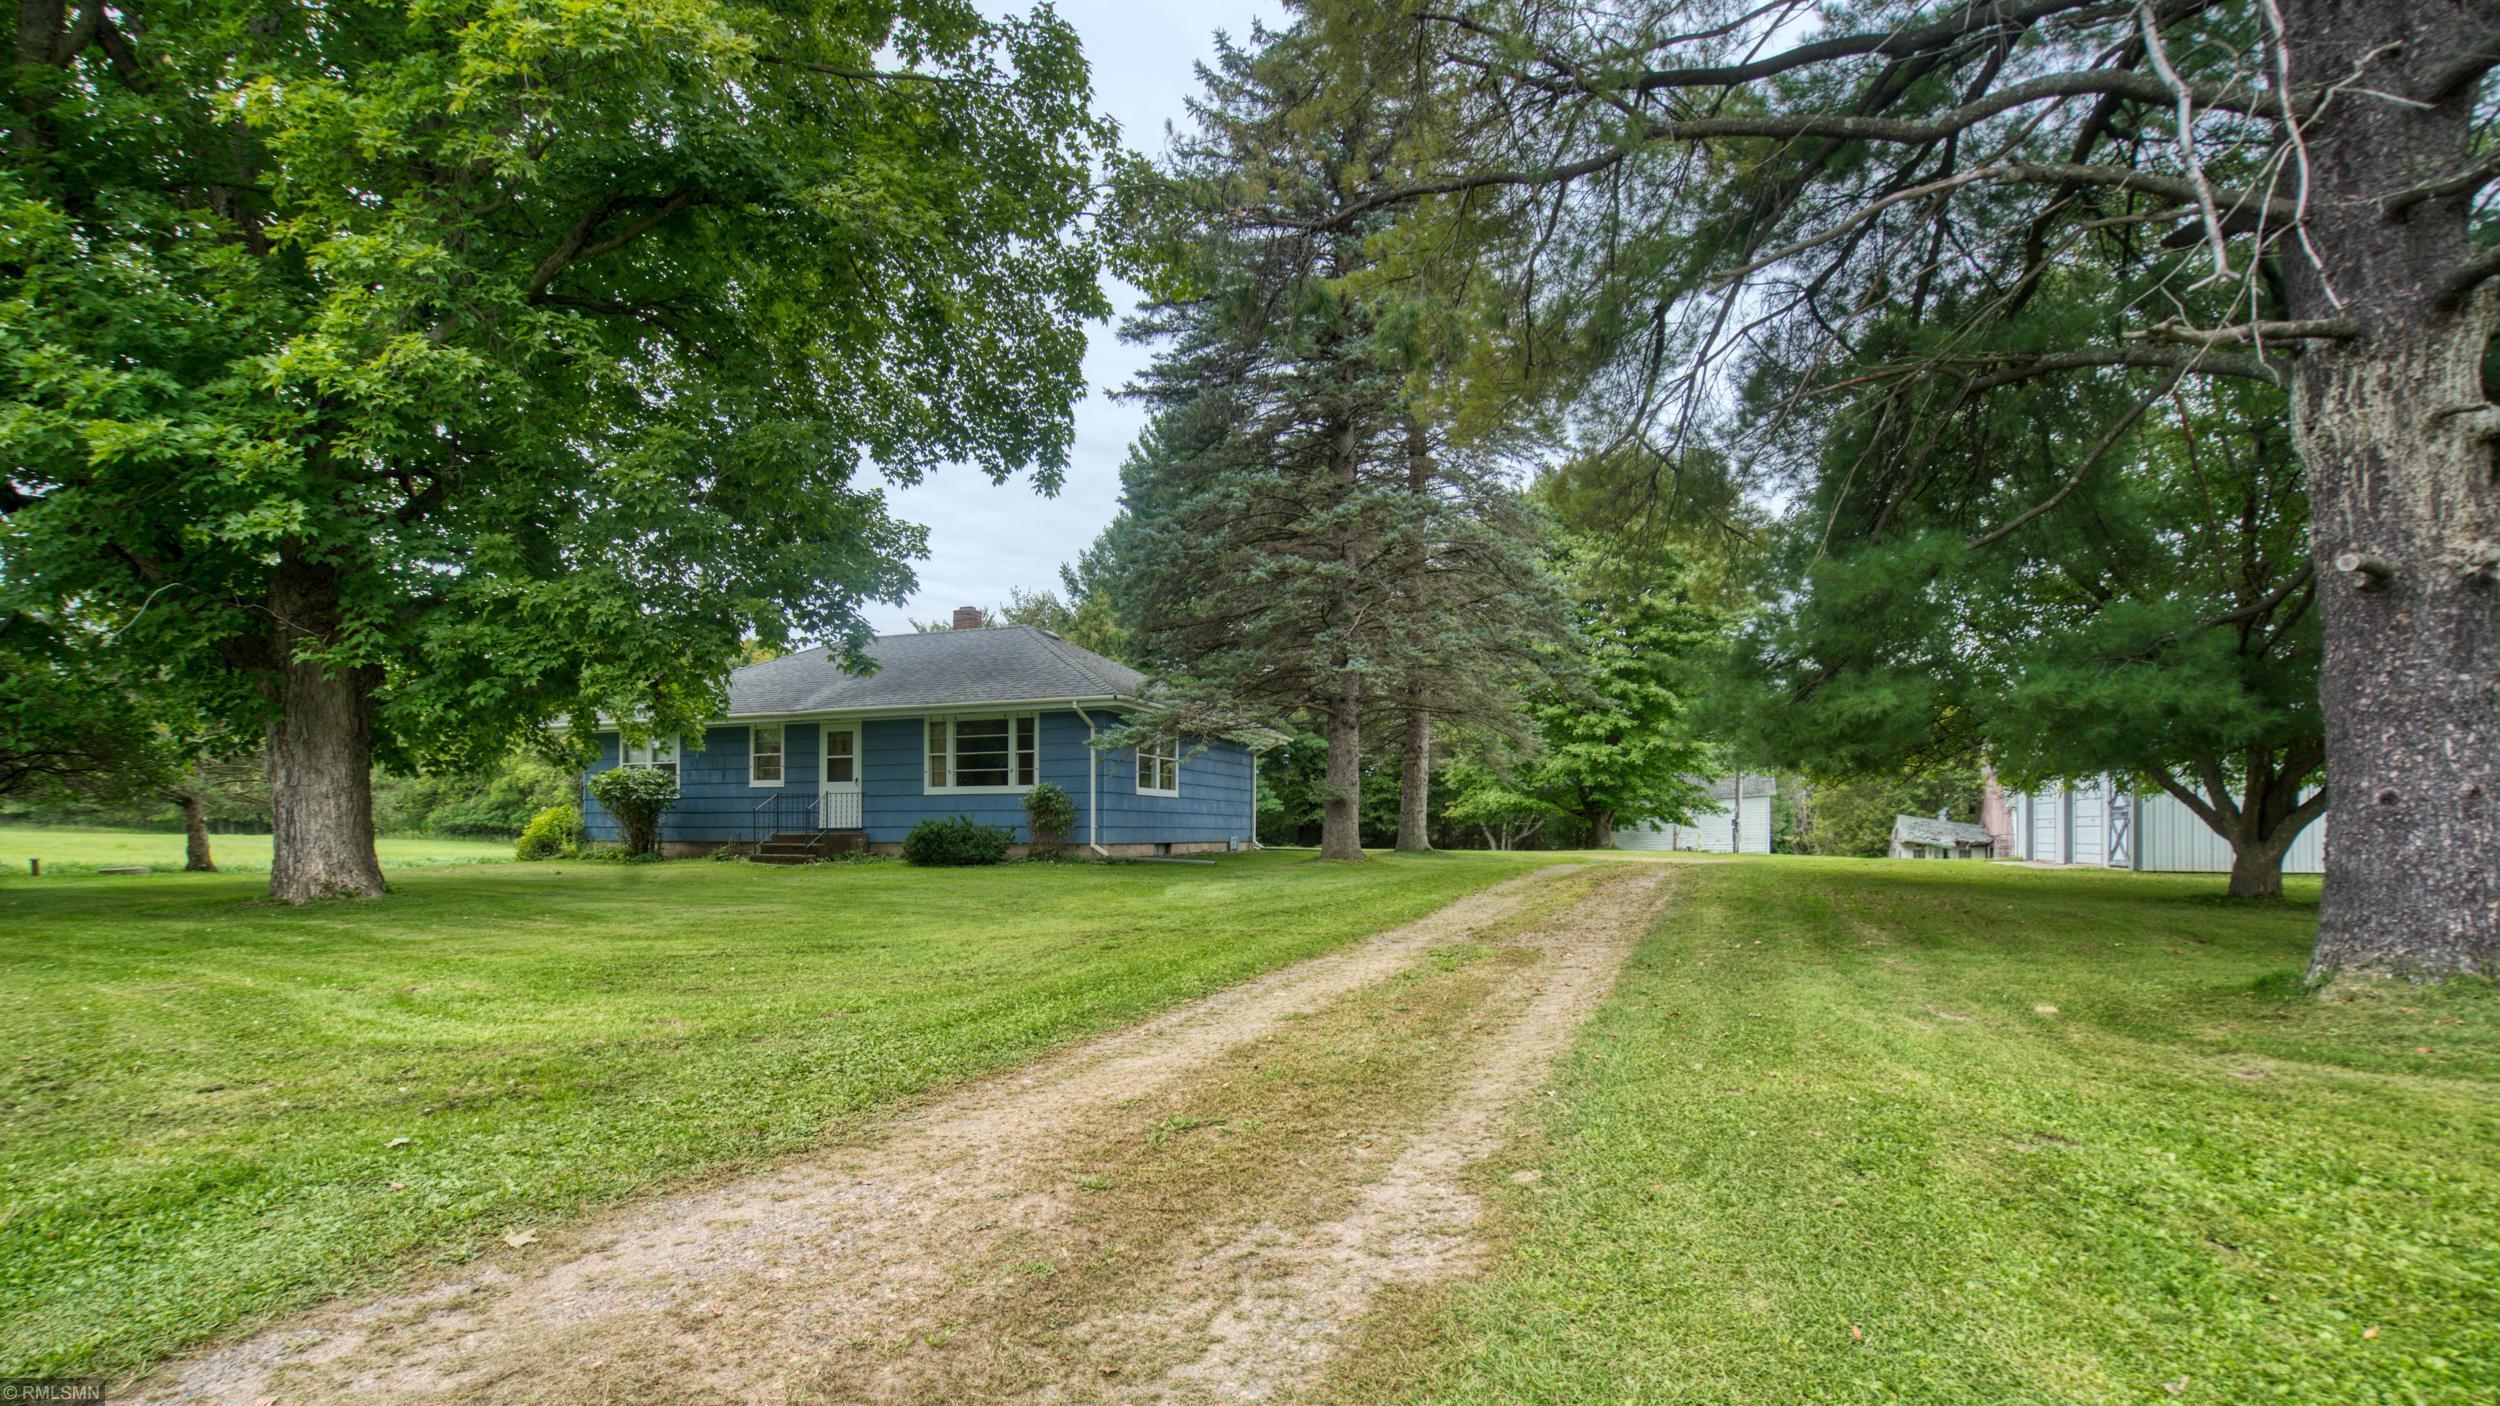 2235 260th Street Property Photo - Eureka Twp, WI real estate listing